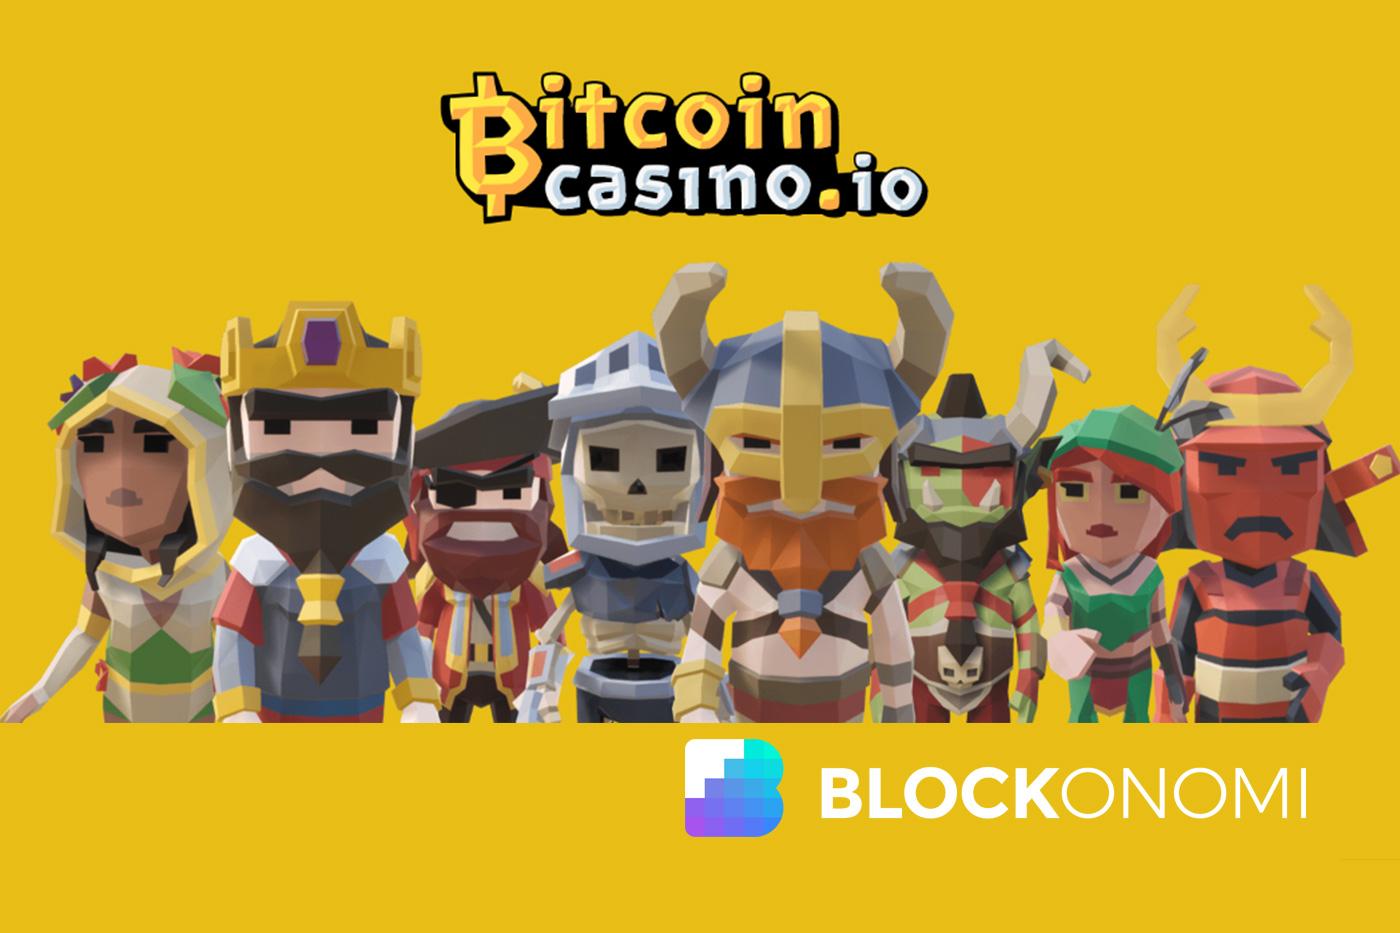 Live bitcoin casino no deposit bonuses